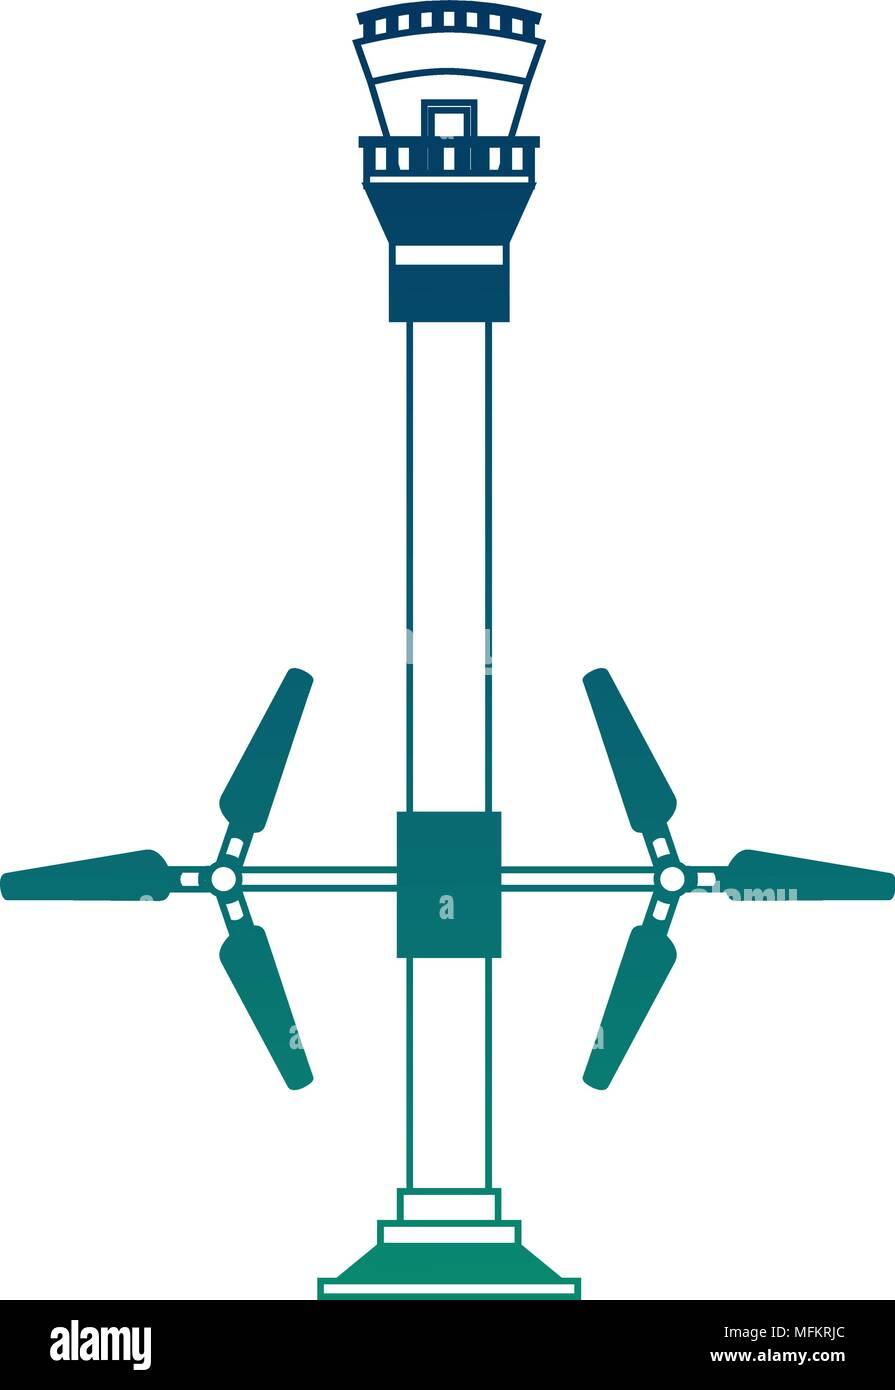 medium resolution of tidal energy station renewable alternative energy stock image